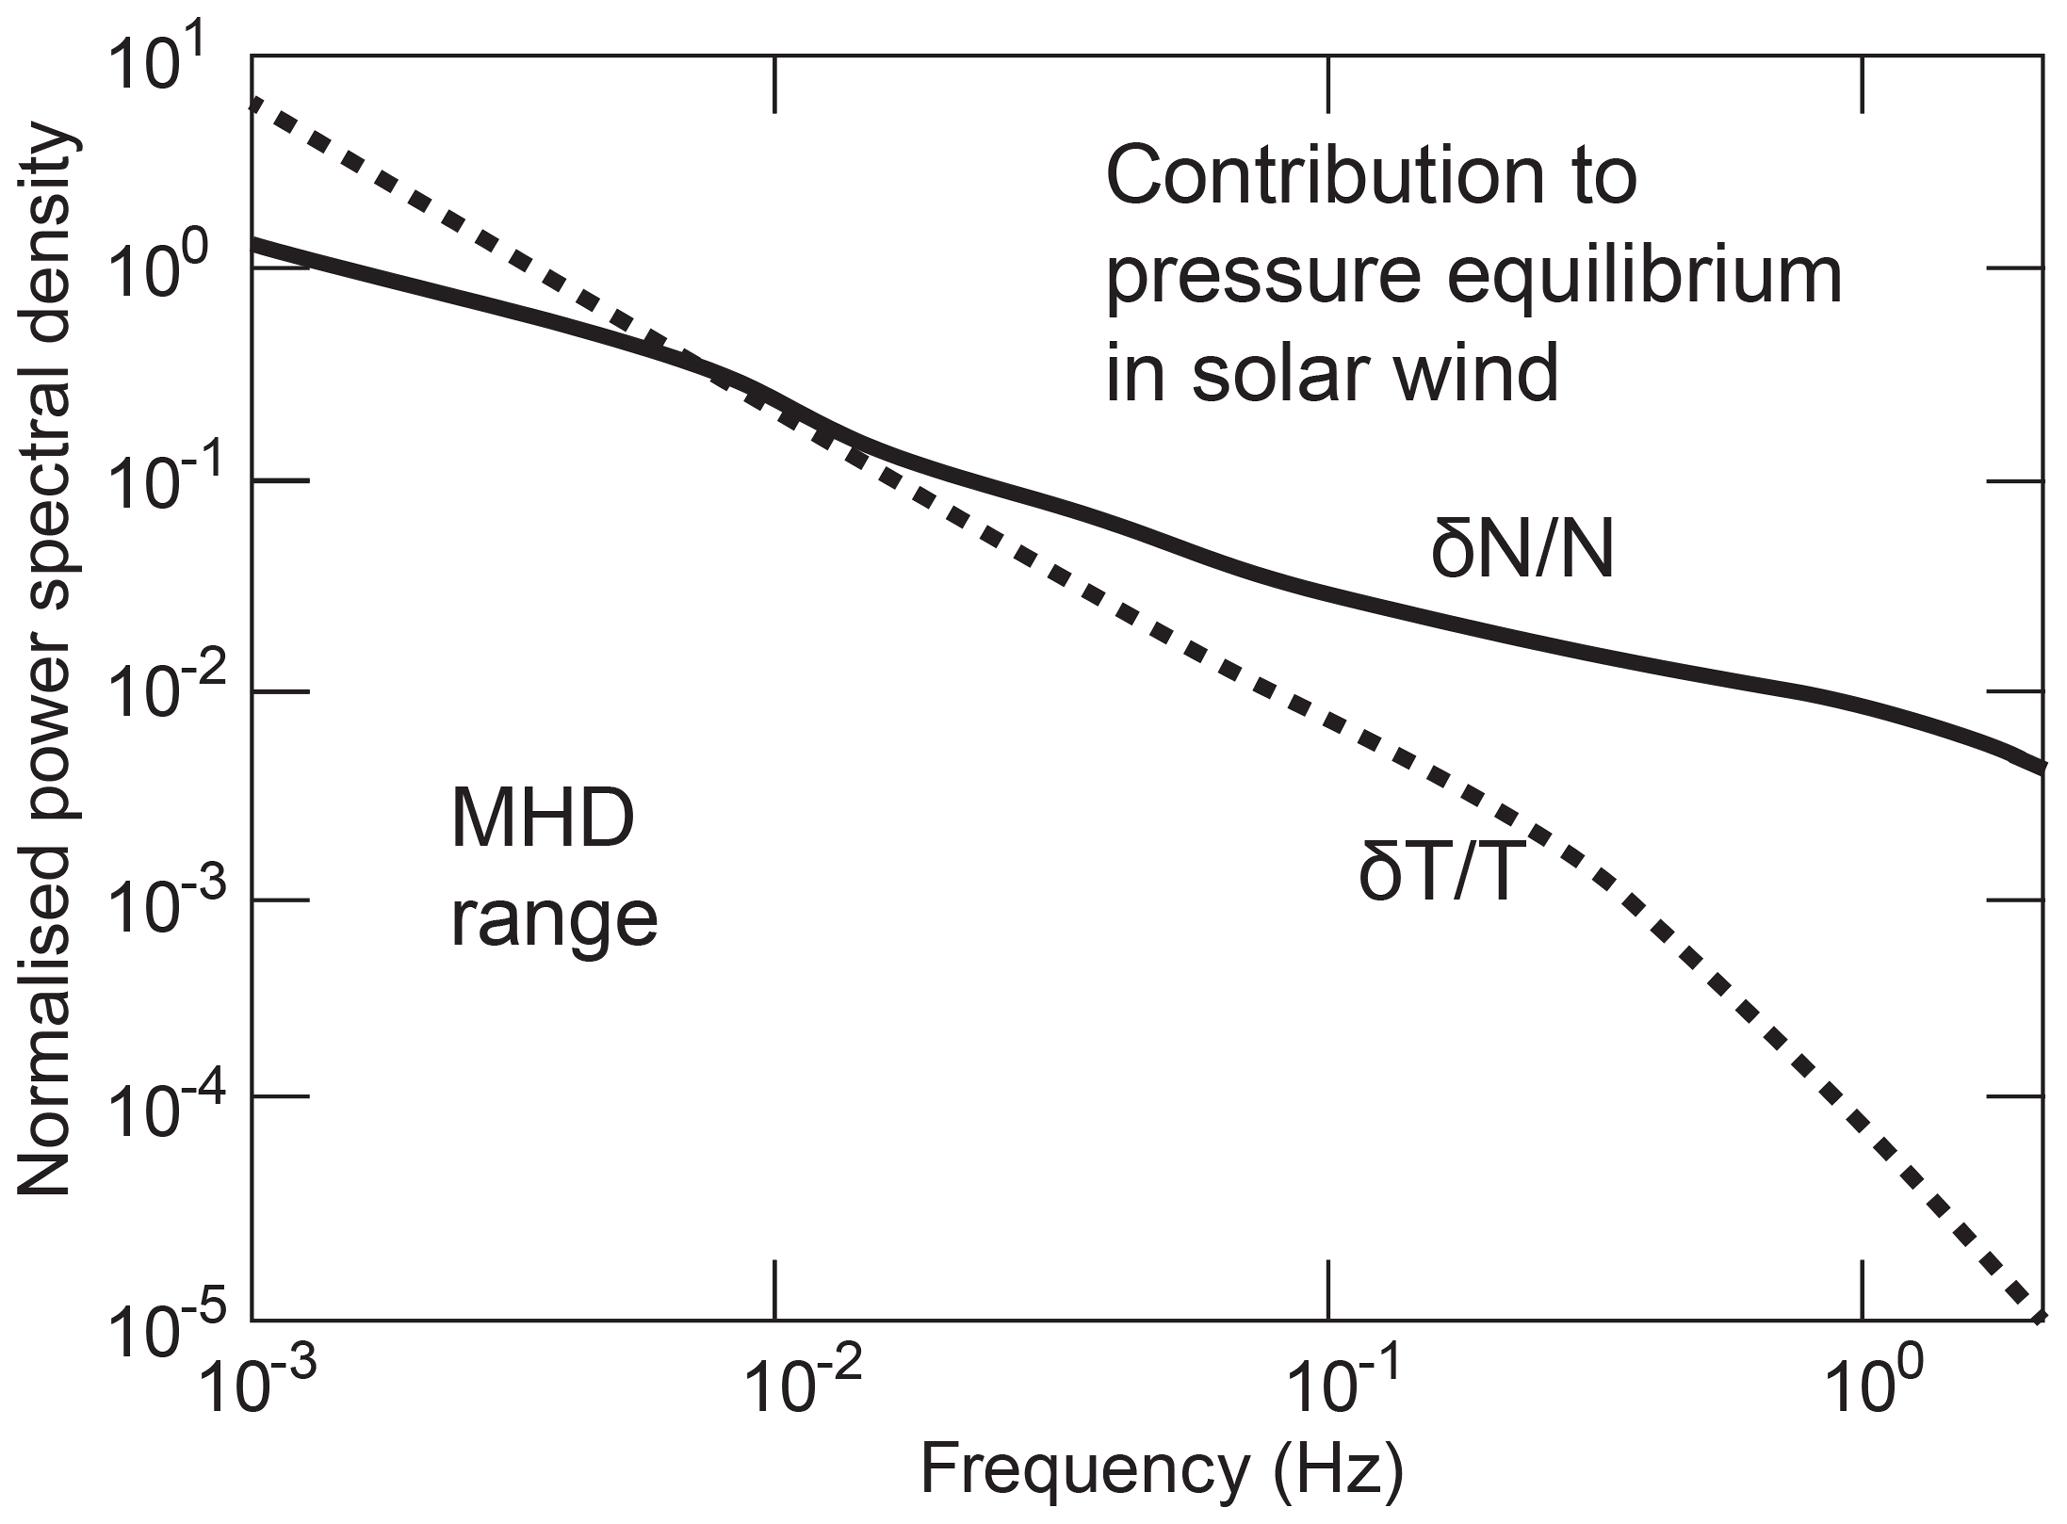 ANGEO - On the ion-inertial-range density-power spectra in